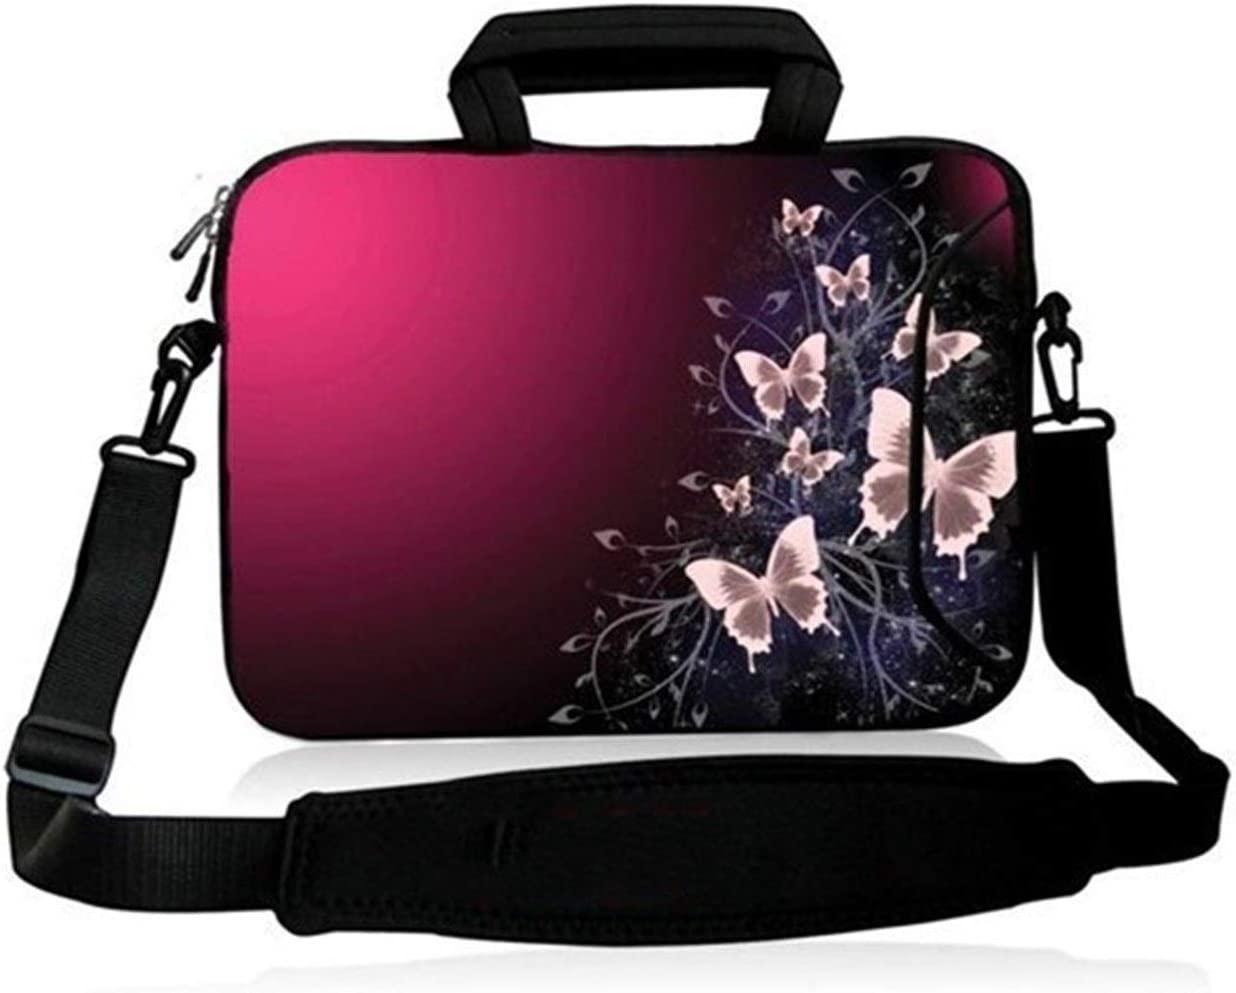 GHDZJPN Laptop Shoulder Pouch 10.1 12 14 17.3 Messenge Don't miss the campaign 15.6 13.3 Ranking TOP6